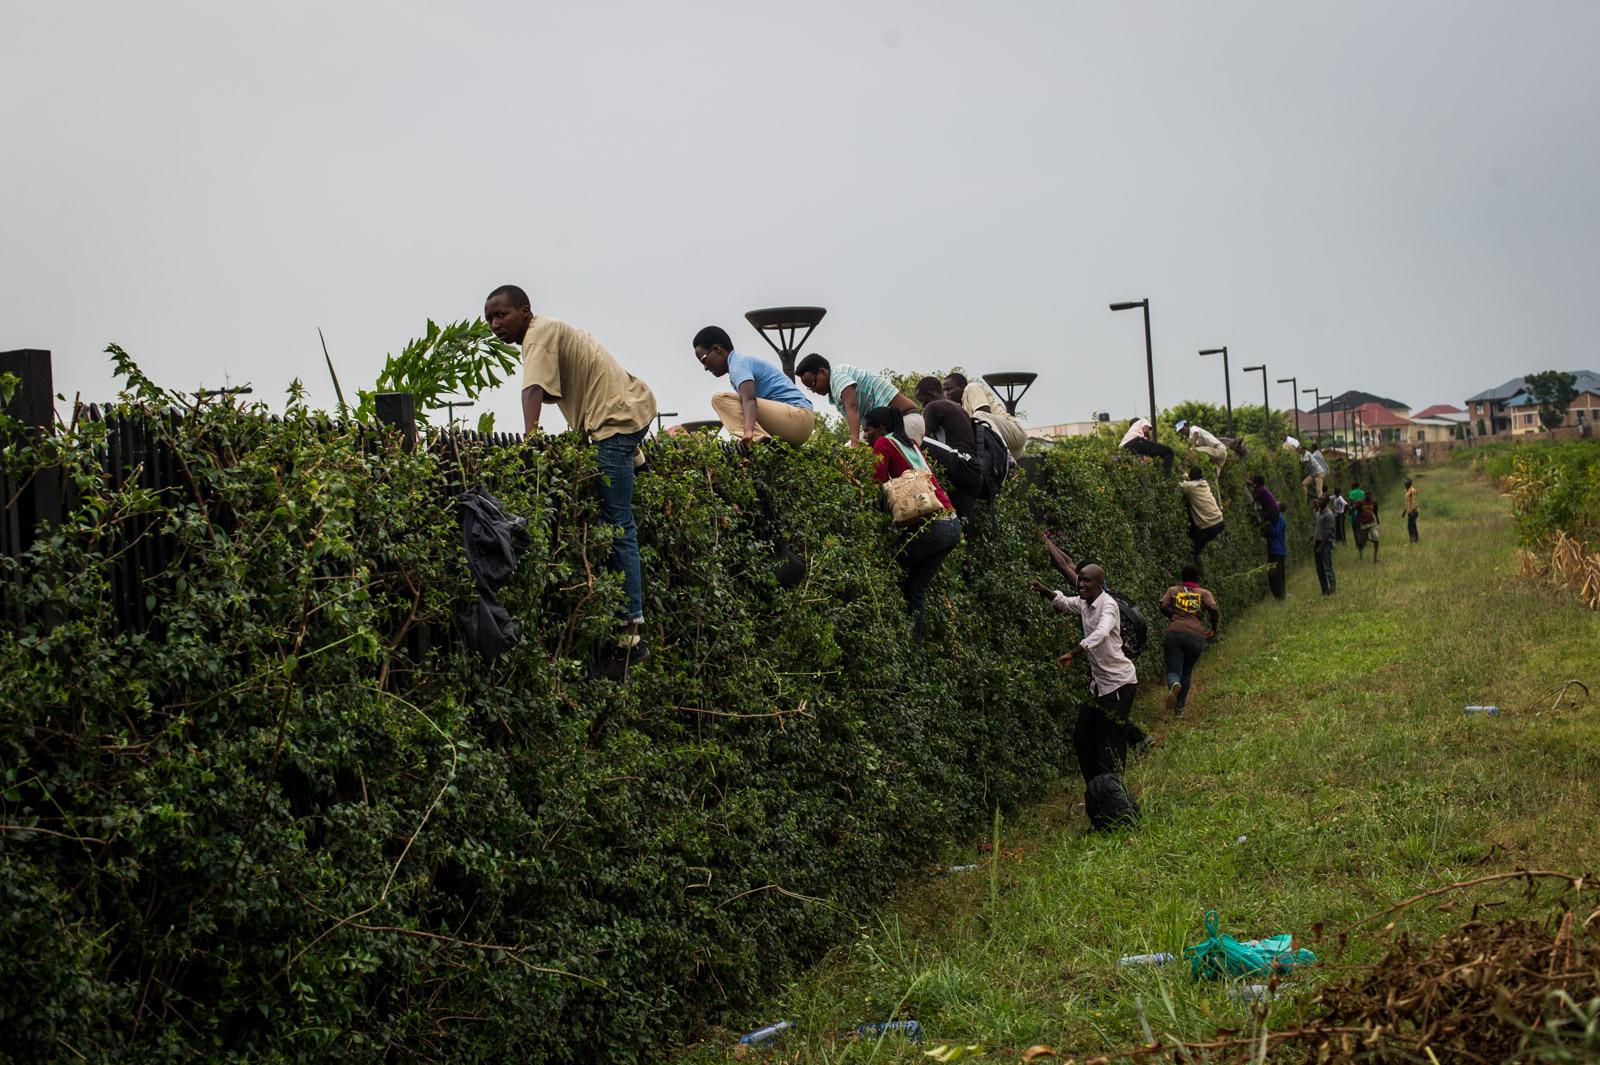 22_PEM_BDI_Burundi_2482.jpg